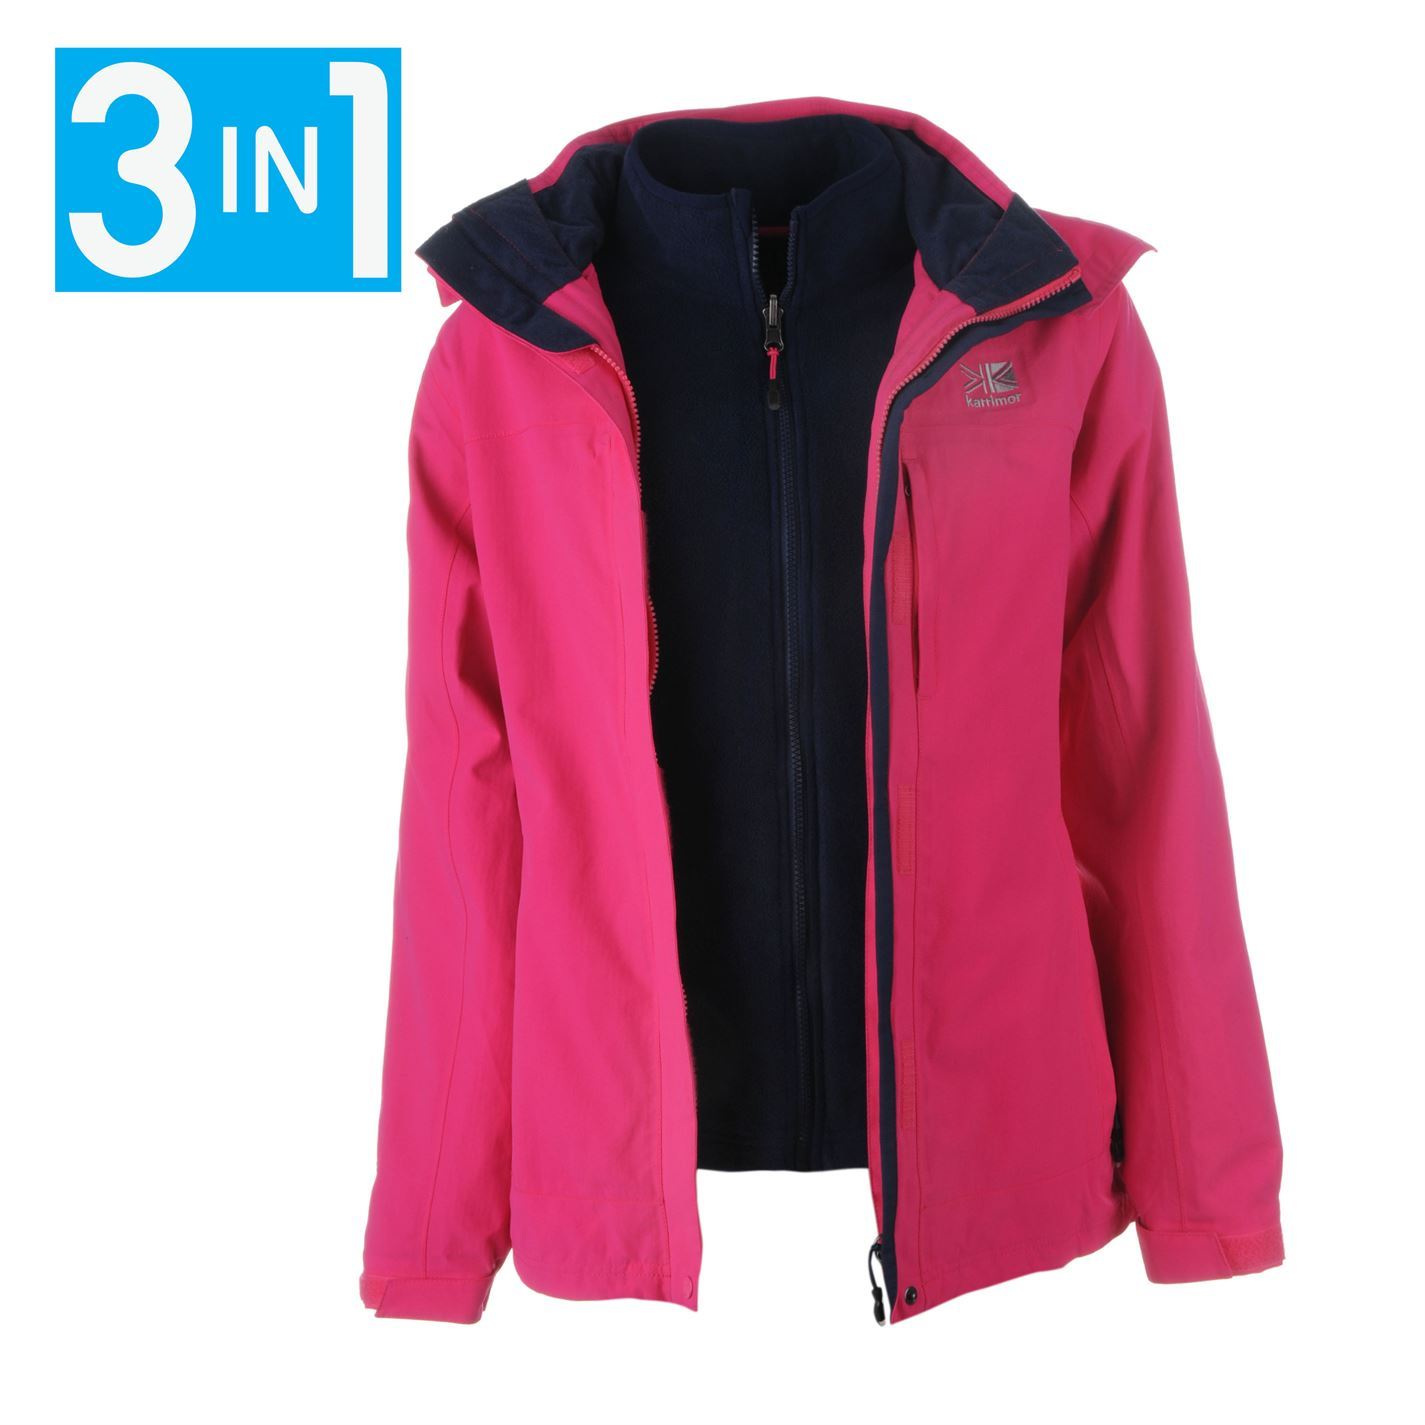 36946096ecf Details about Karrimor Womens 3in1 Jacket Coat Top Ladies Hooded Fleece  Mesh Lining Warm Sport